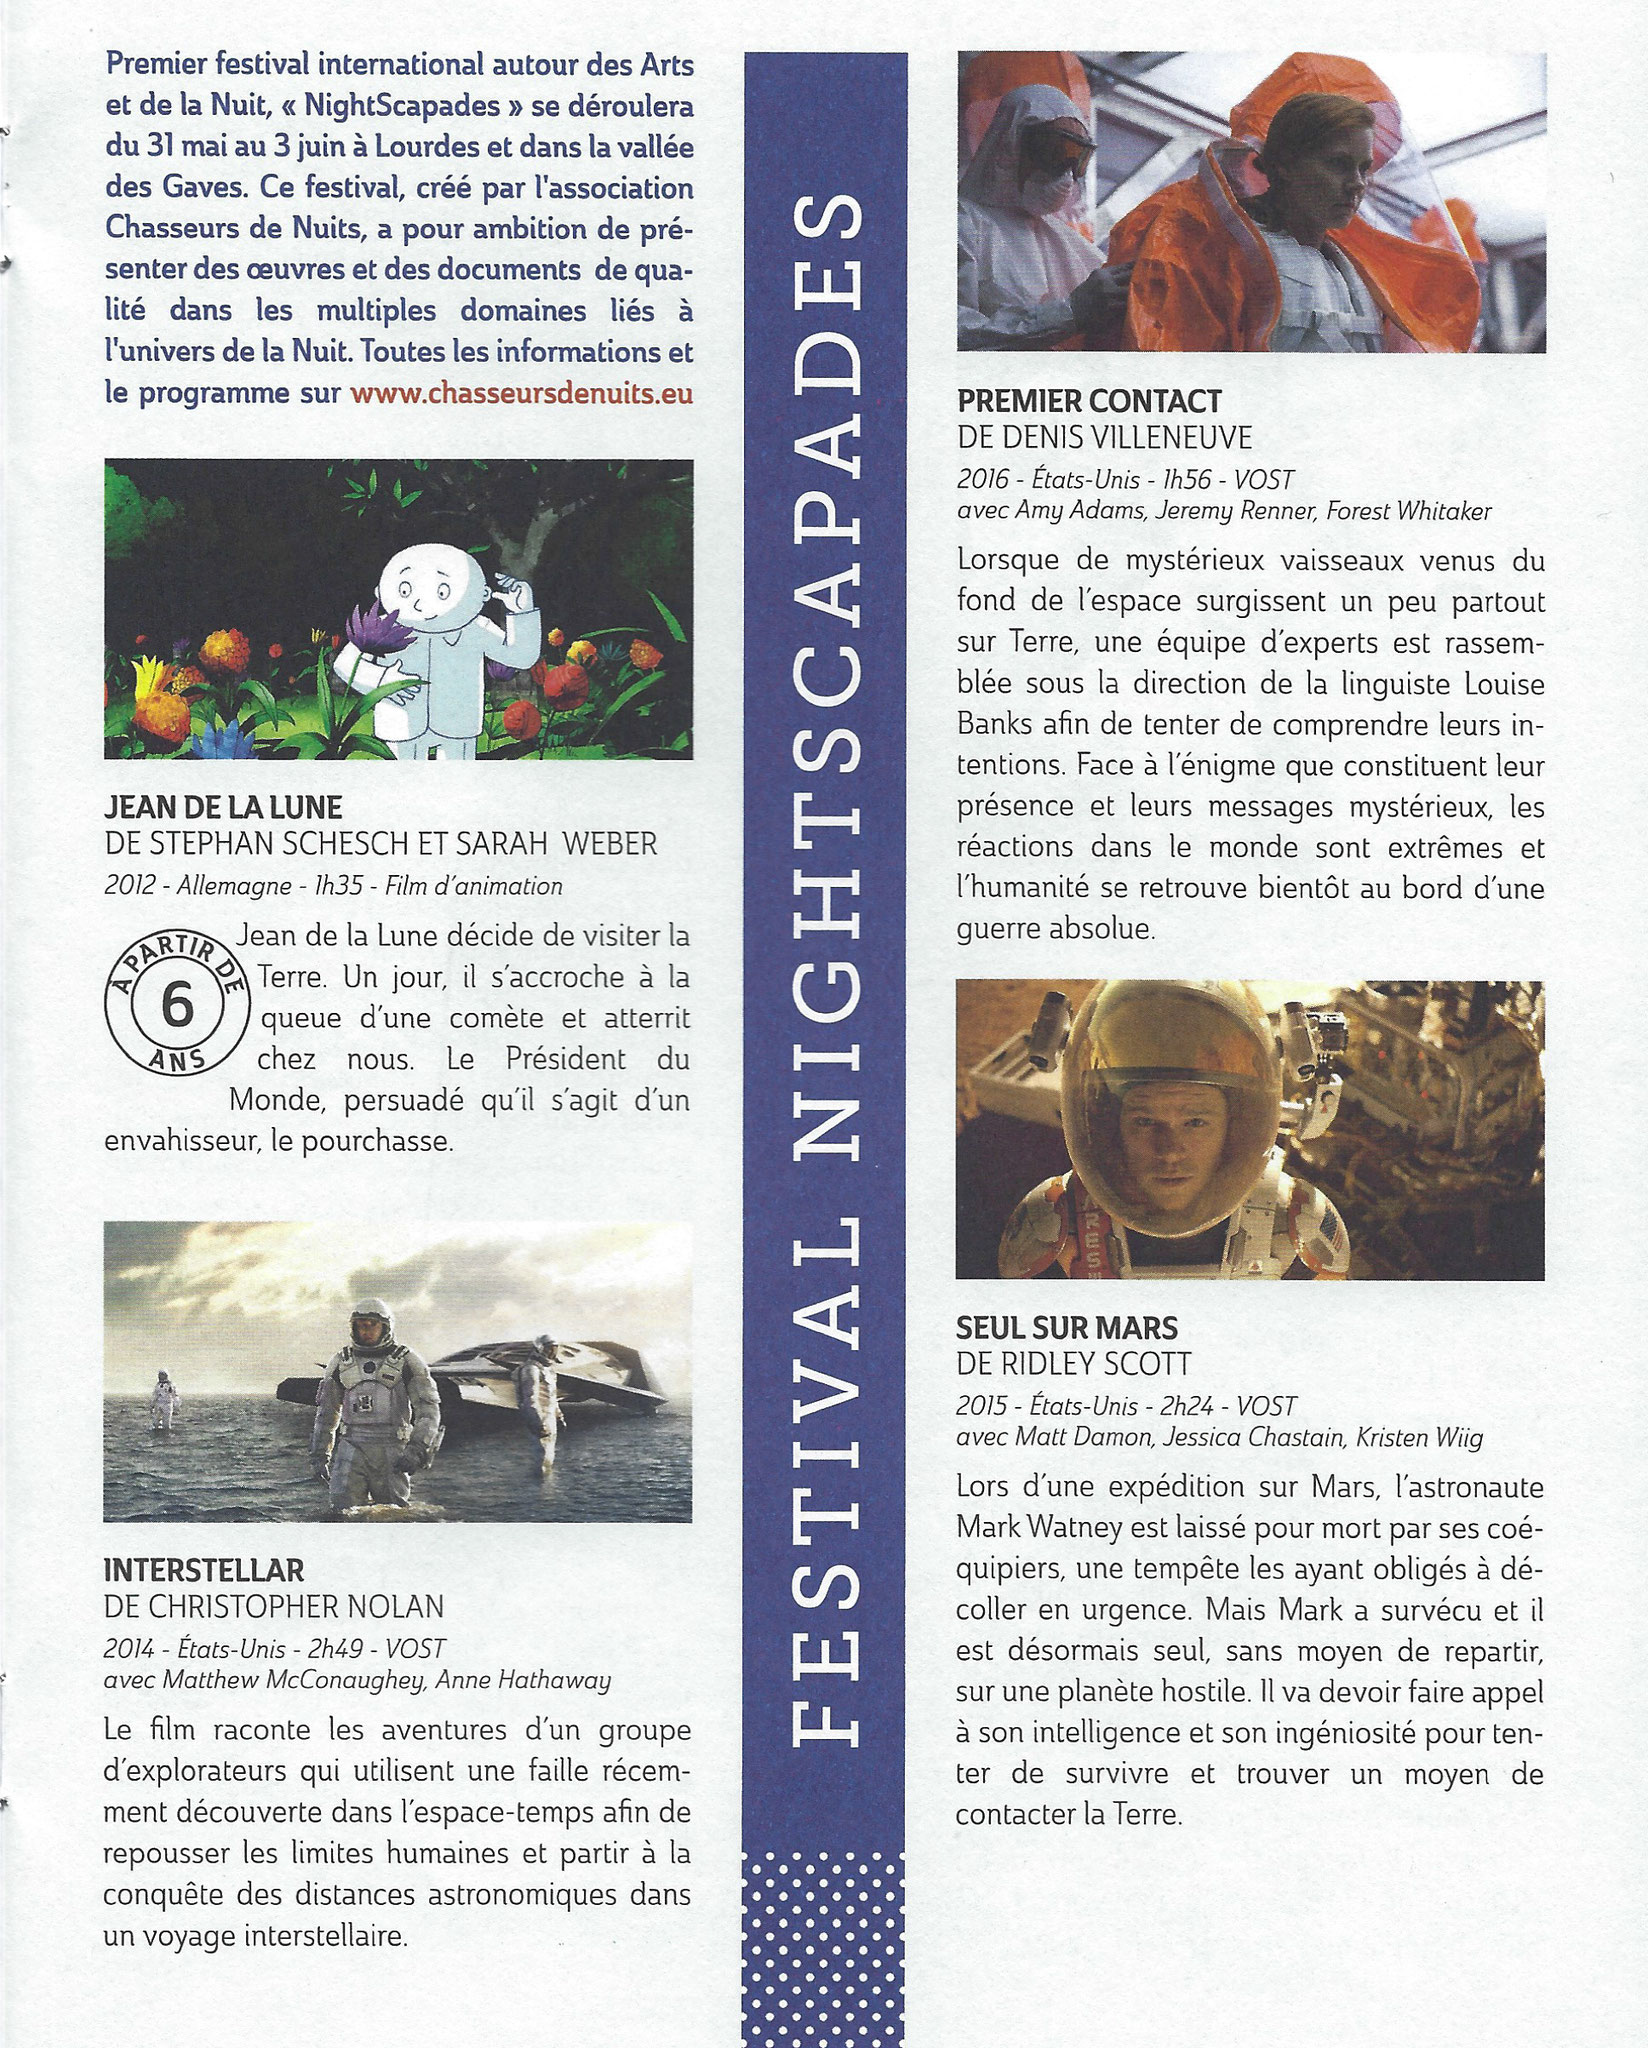 Journal du Parvis (Cinéma)- Tarbes